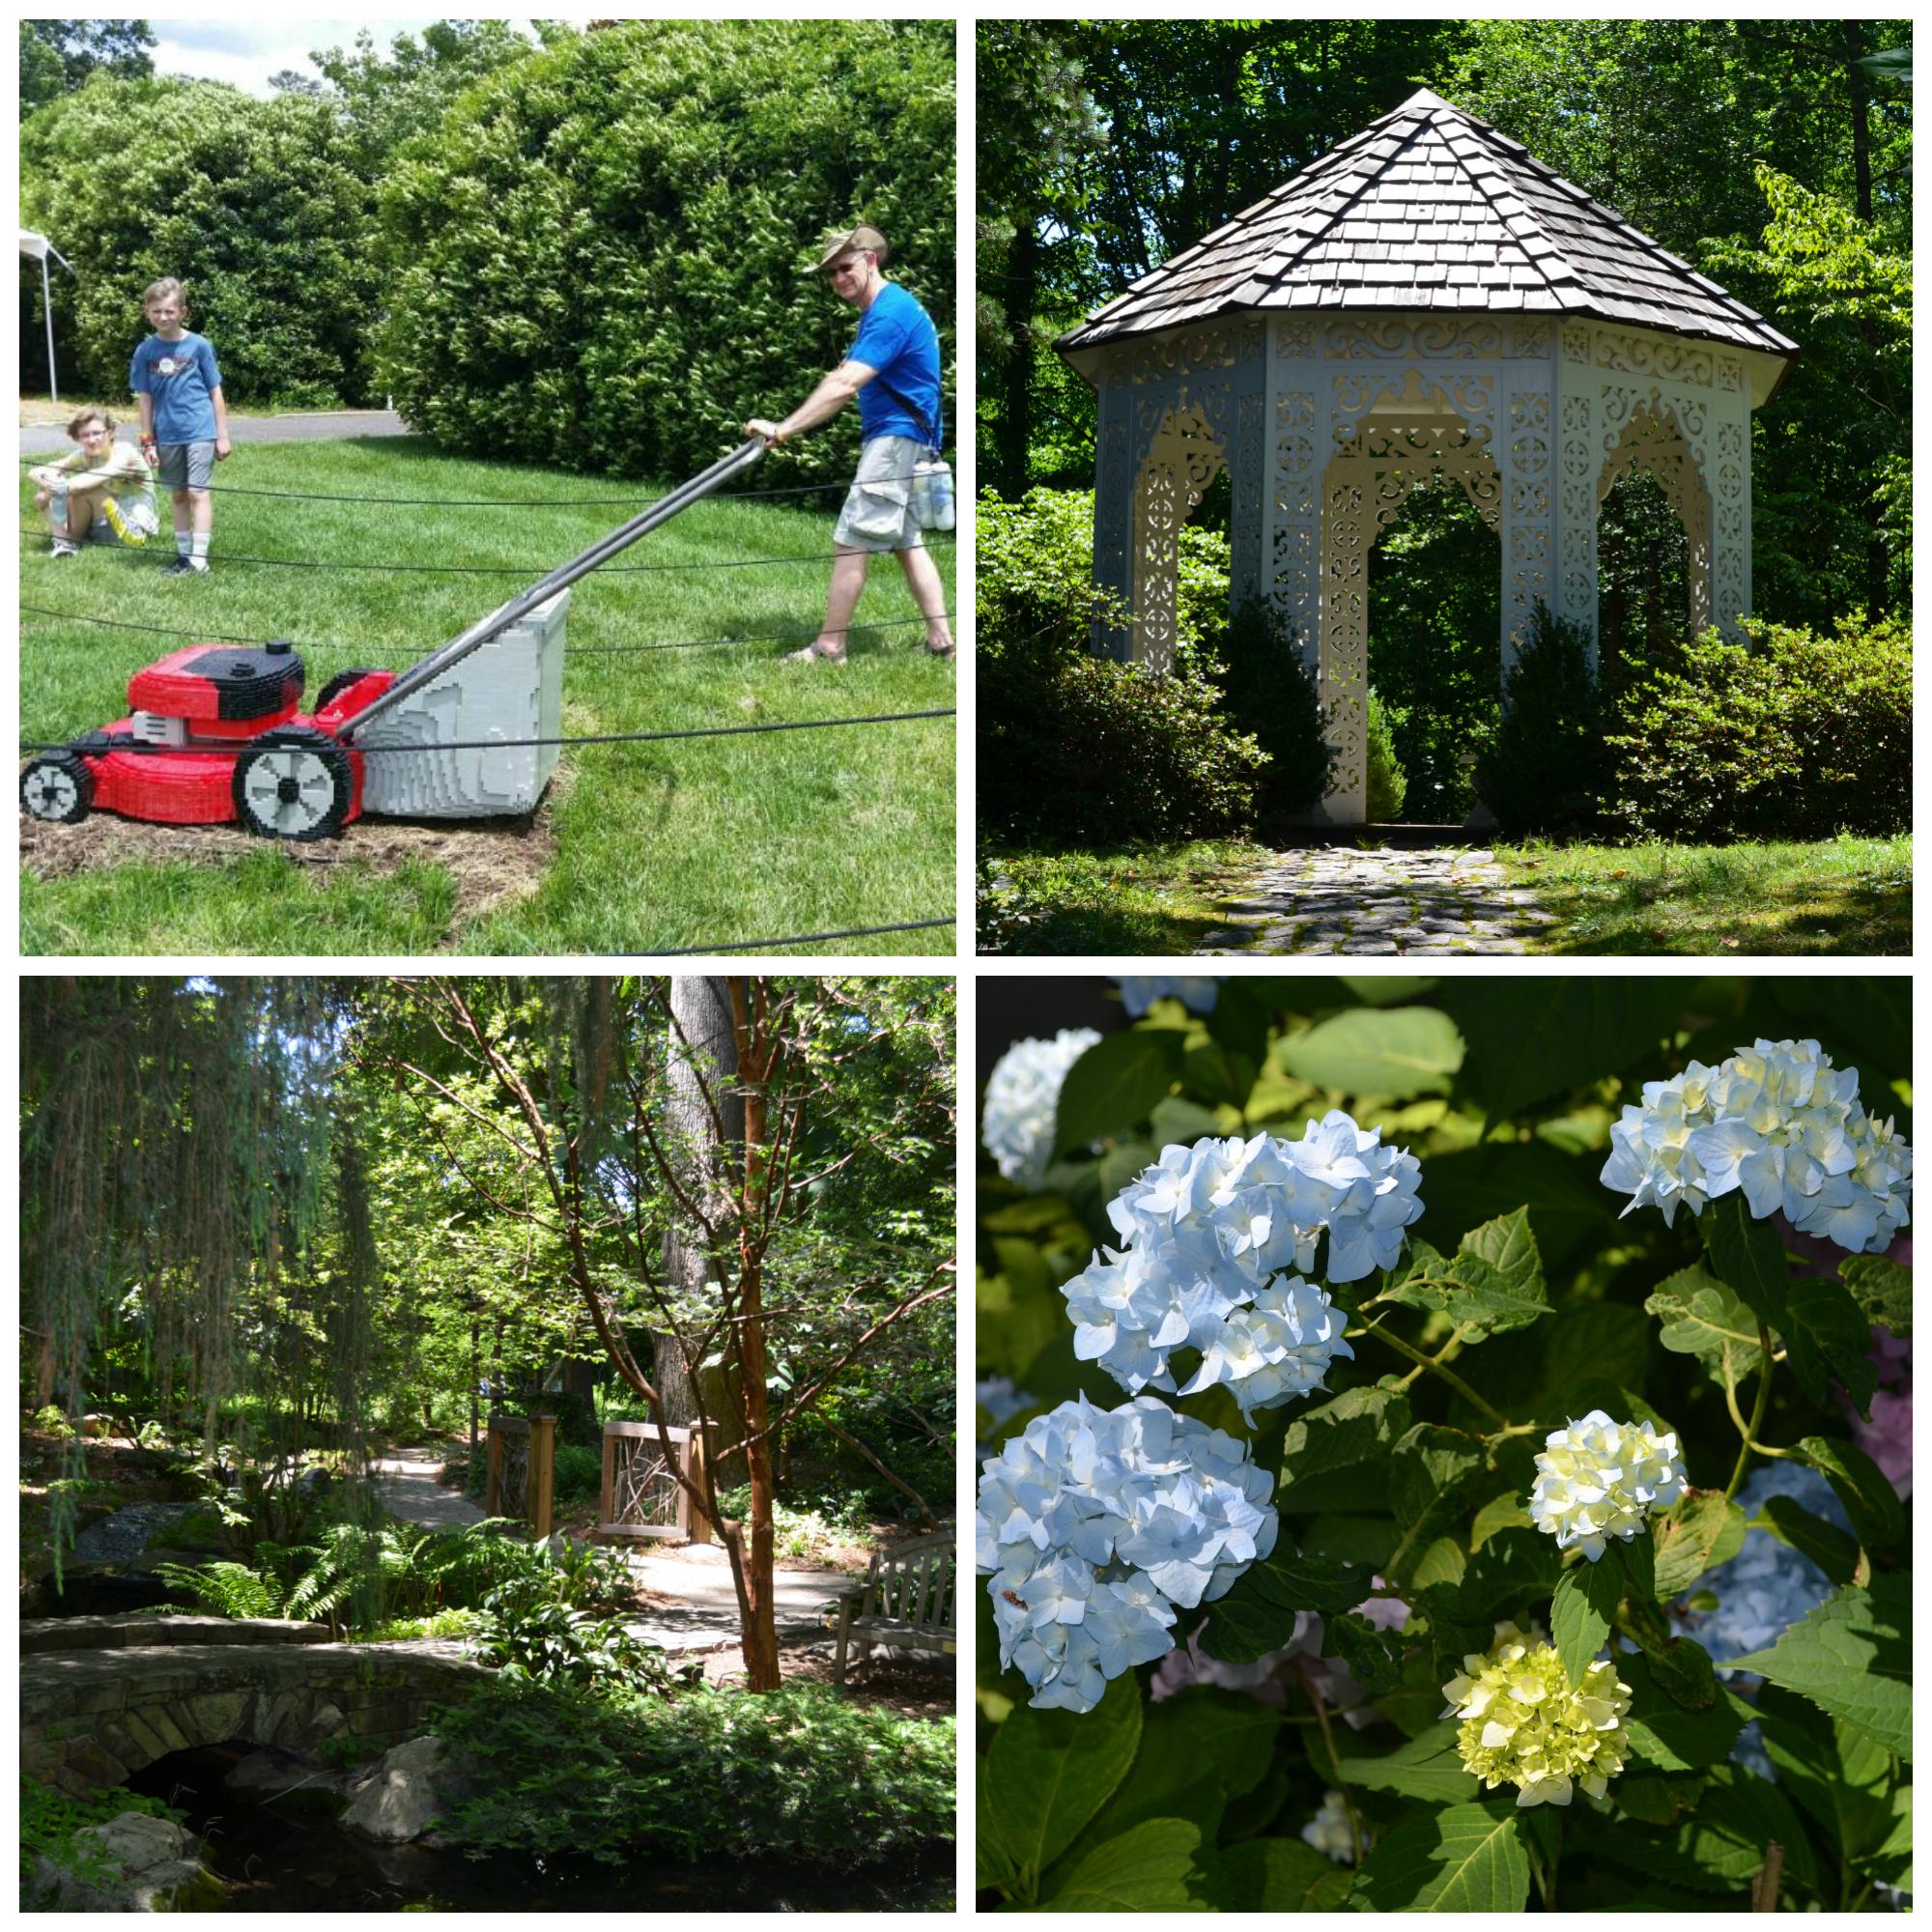 lawnmower lego brick sculpture, lace house, dot's garden, hydrangea